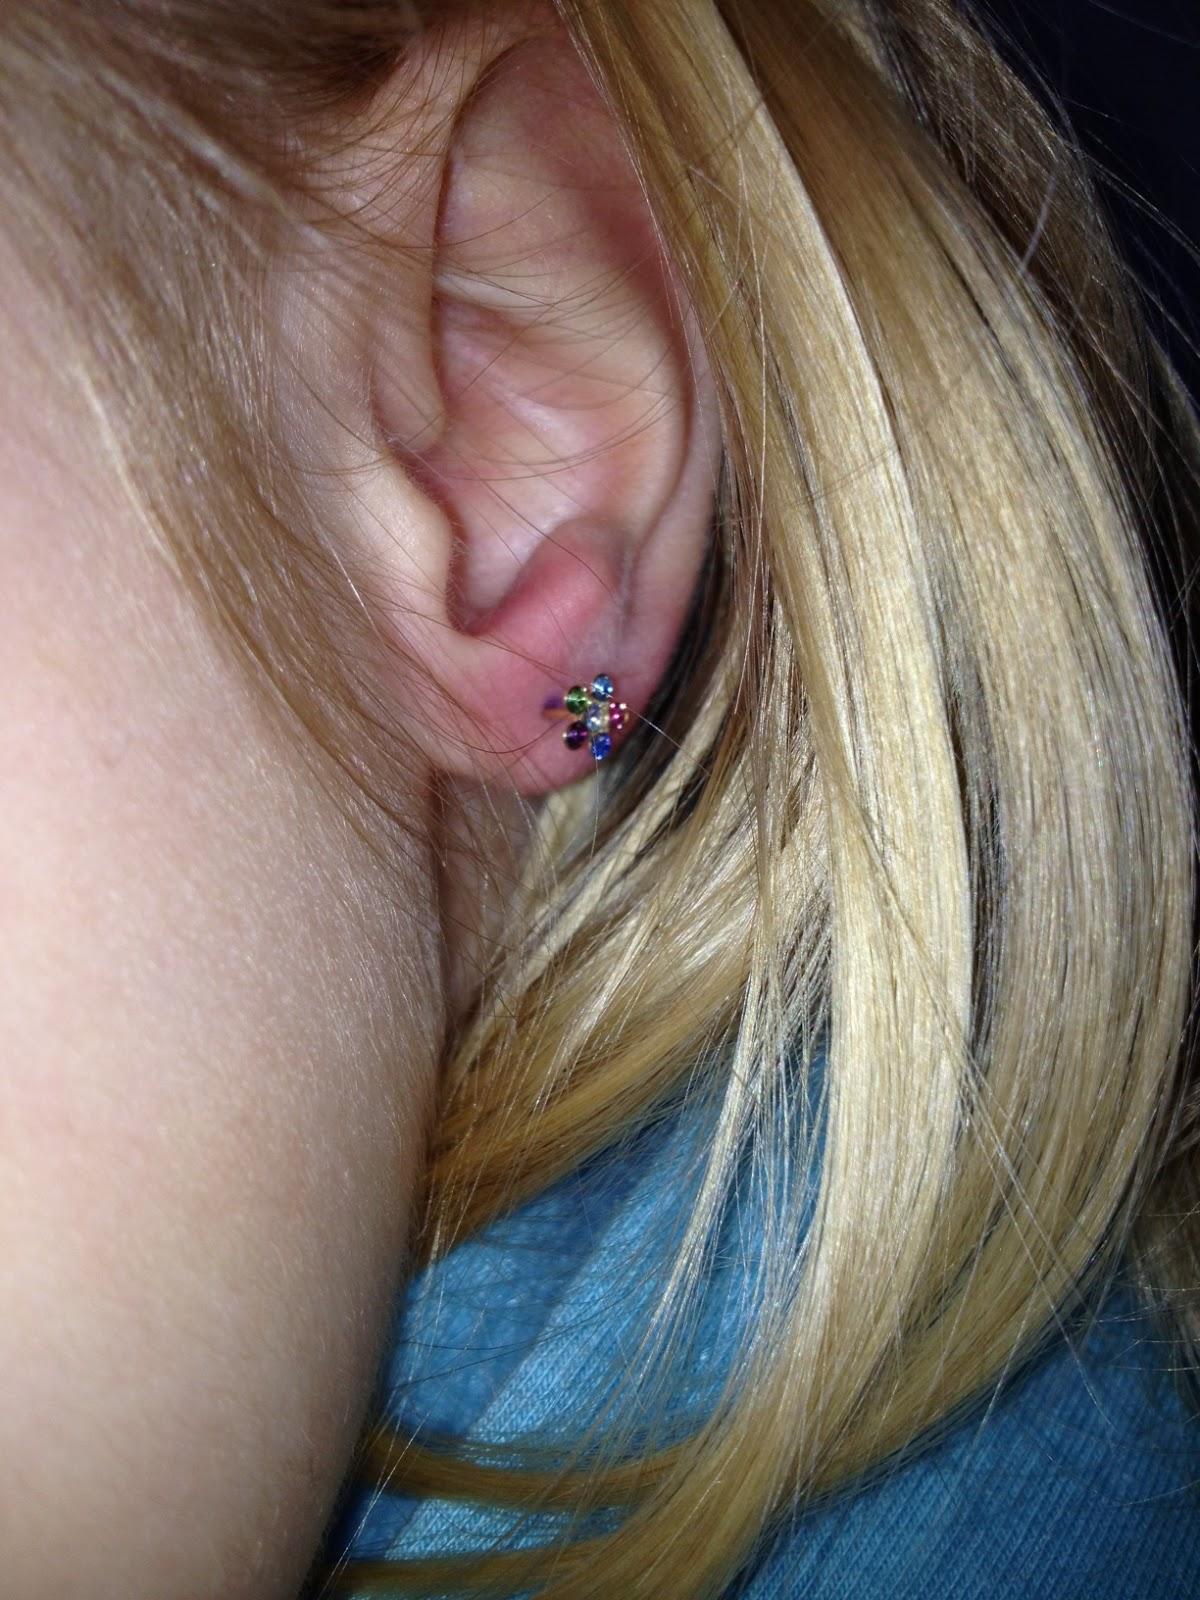 Cute ear piercing cute baby saturday ear